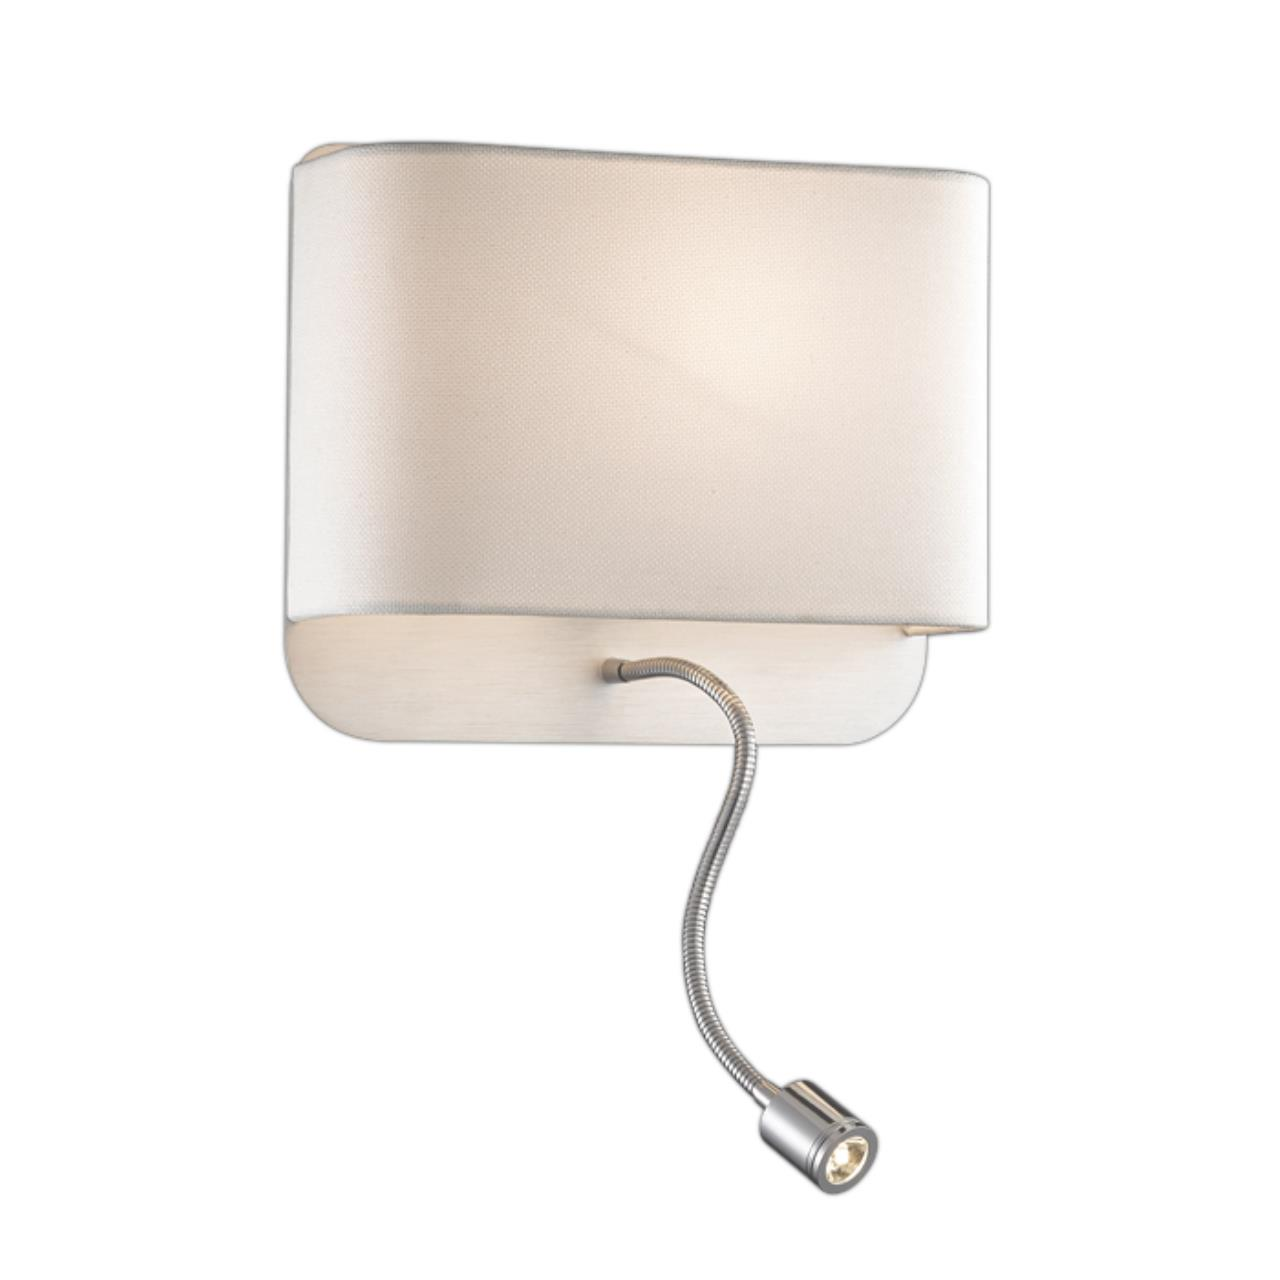 2588/2W L-VISION ODL14 115 хром/абажур белый Бра с выкл E27 60W+1W LED 220V BOSTRI